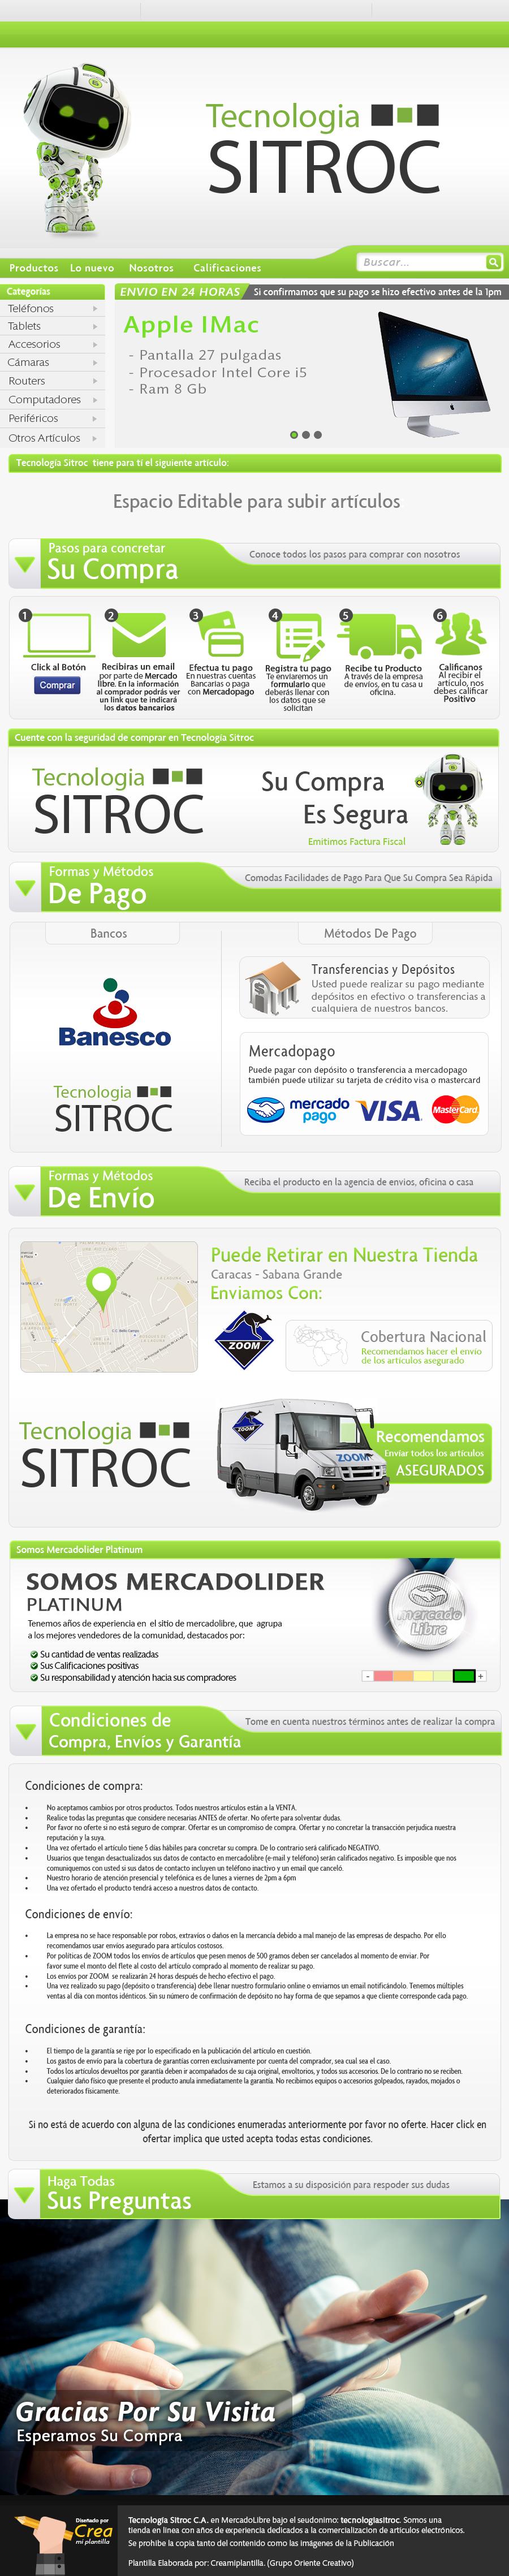 TECNOLOGÍA SITROC- Venta de accesorios para Teléfonos. Elaborado por ...